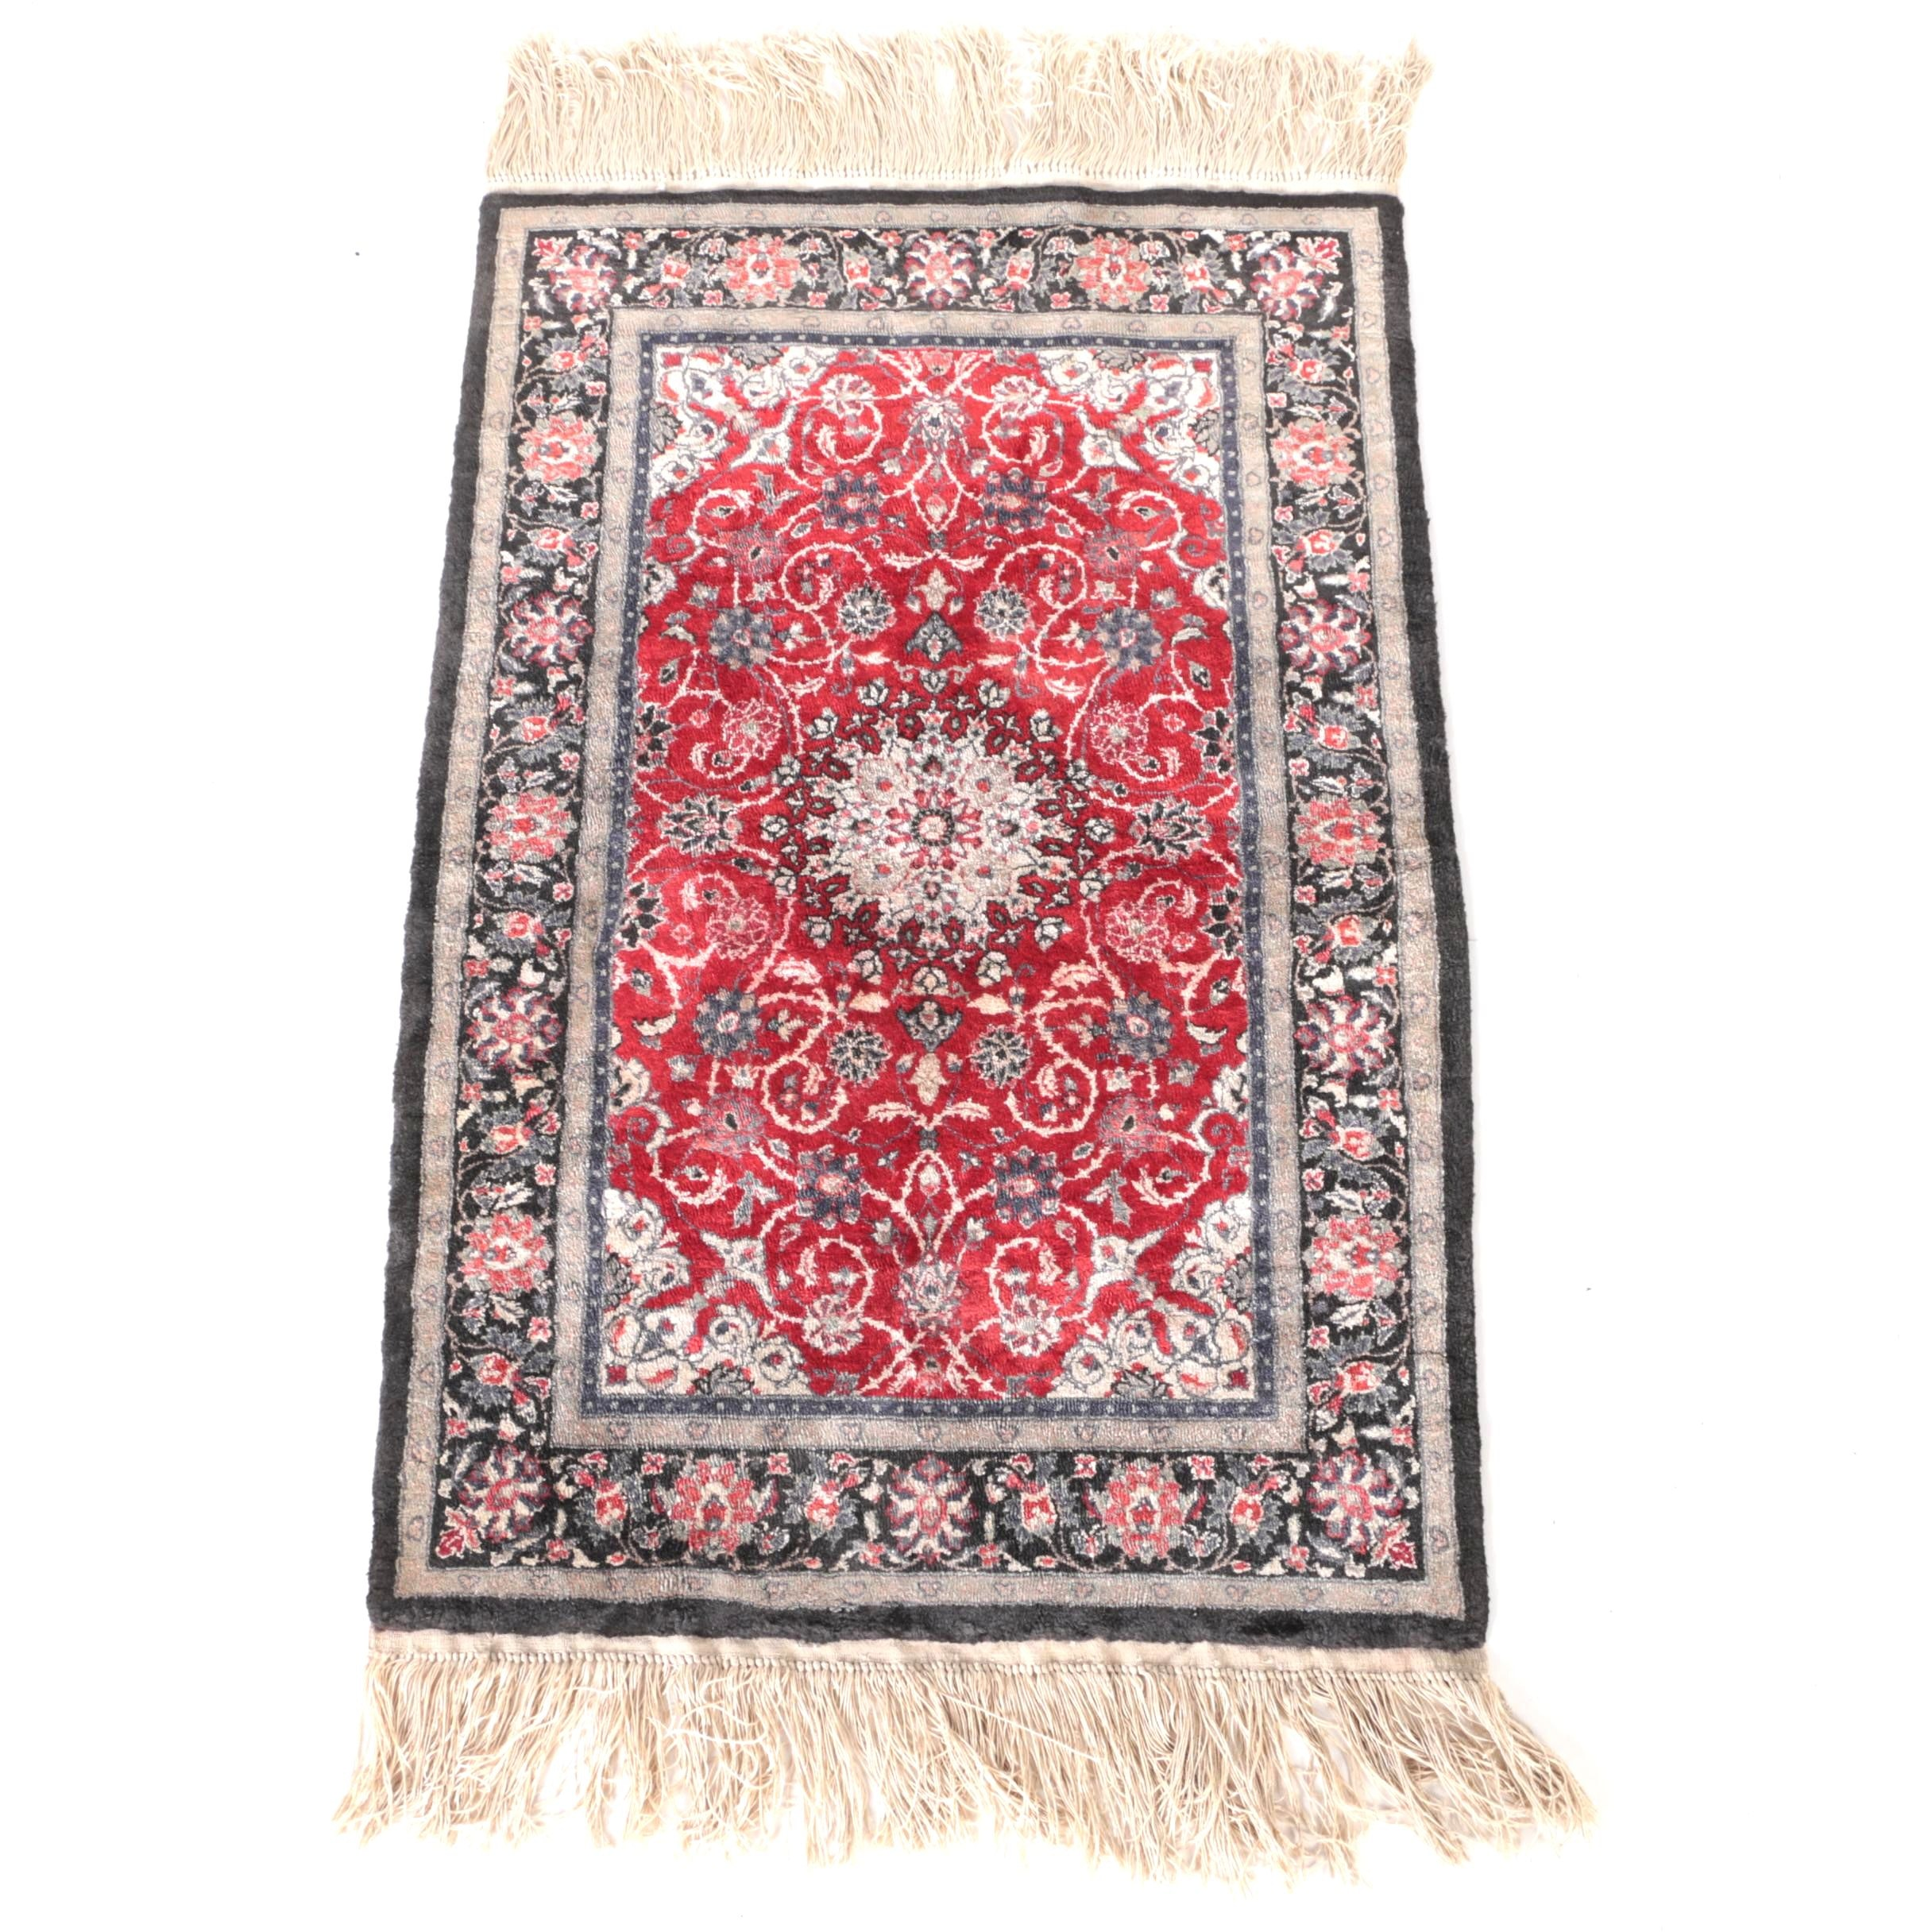 Hand-Knotted Tabriz Area Rug